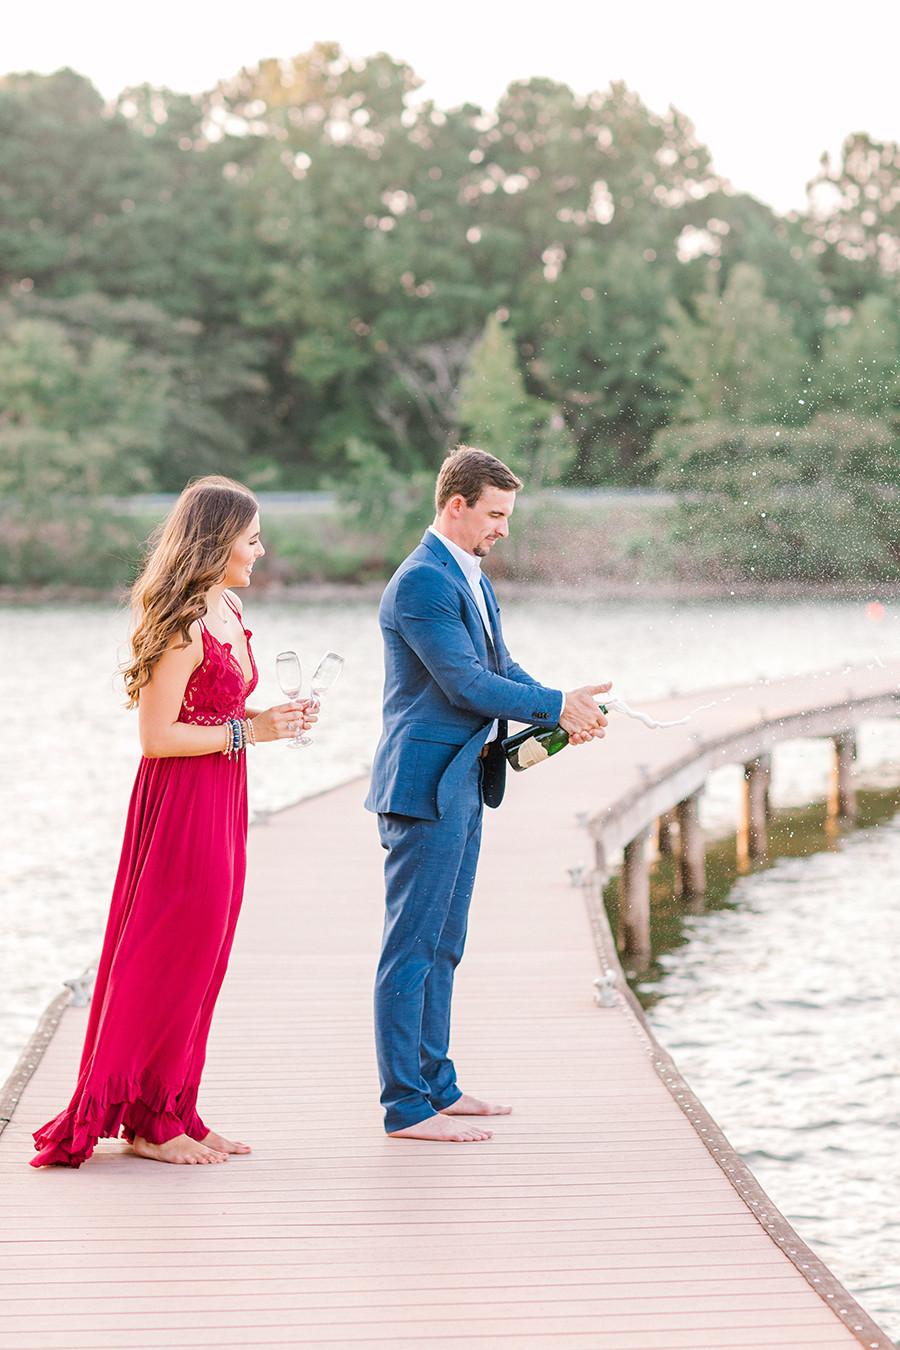 Ben + Mallory Engagement at Children's Harbor on Lake Martin, AL